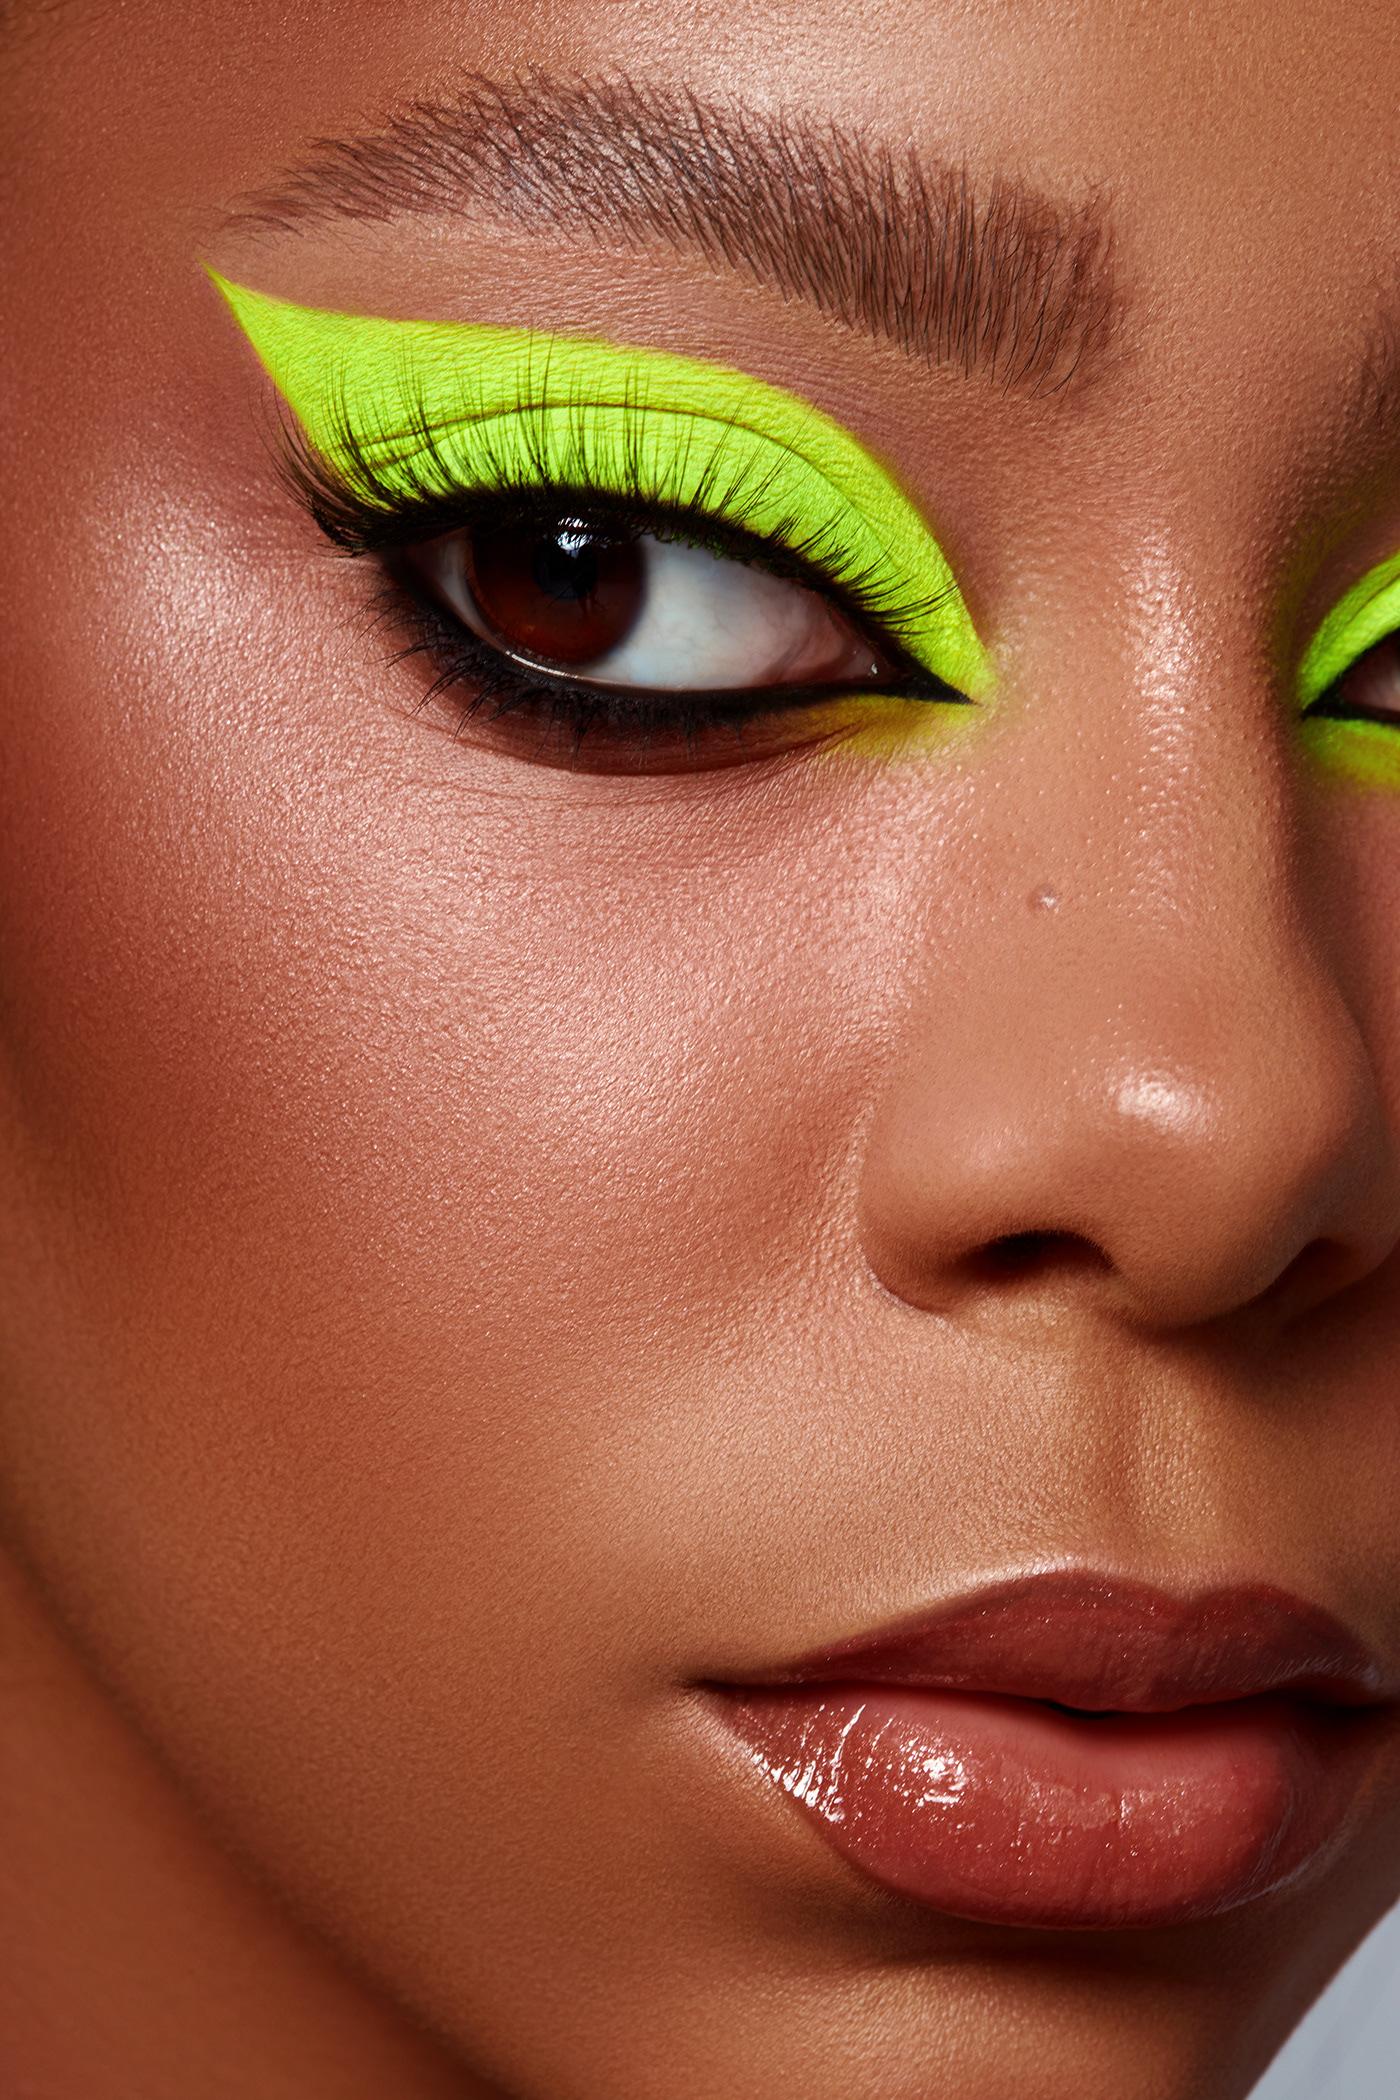 beauty beauty photography close up macro Make Up neon photoediting retouch retouching  visage